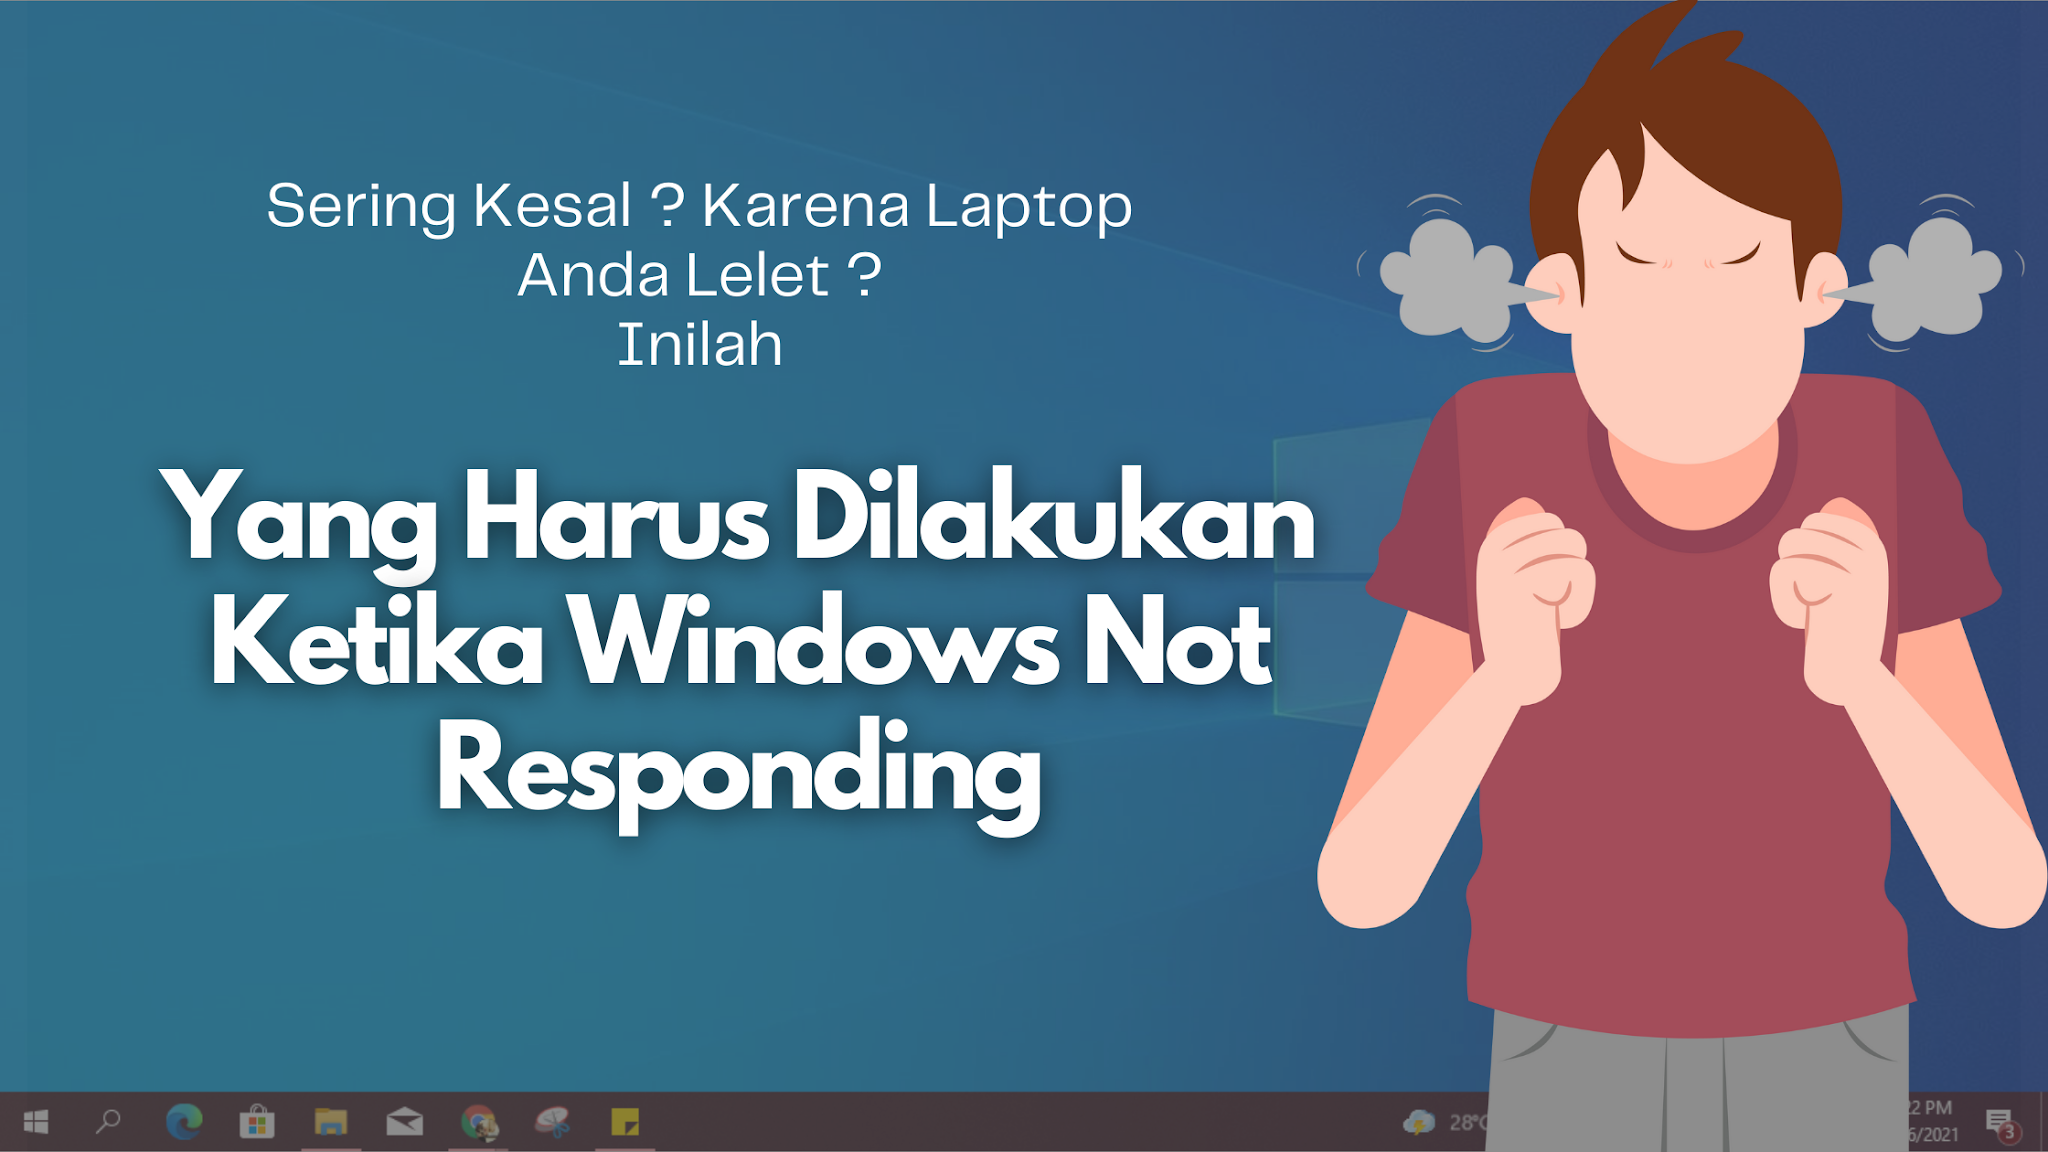 Yang Harus Dilakukan Ketika Windows Not Responding